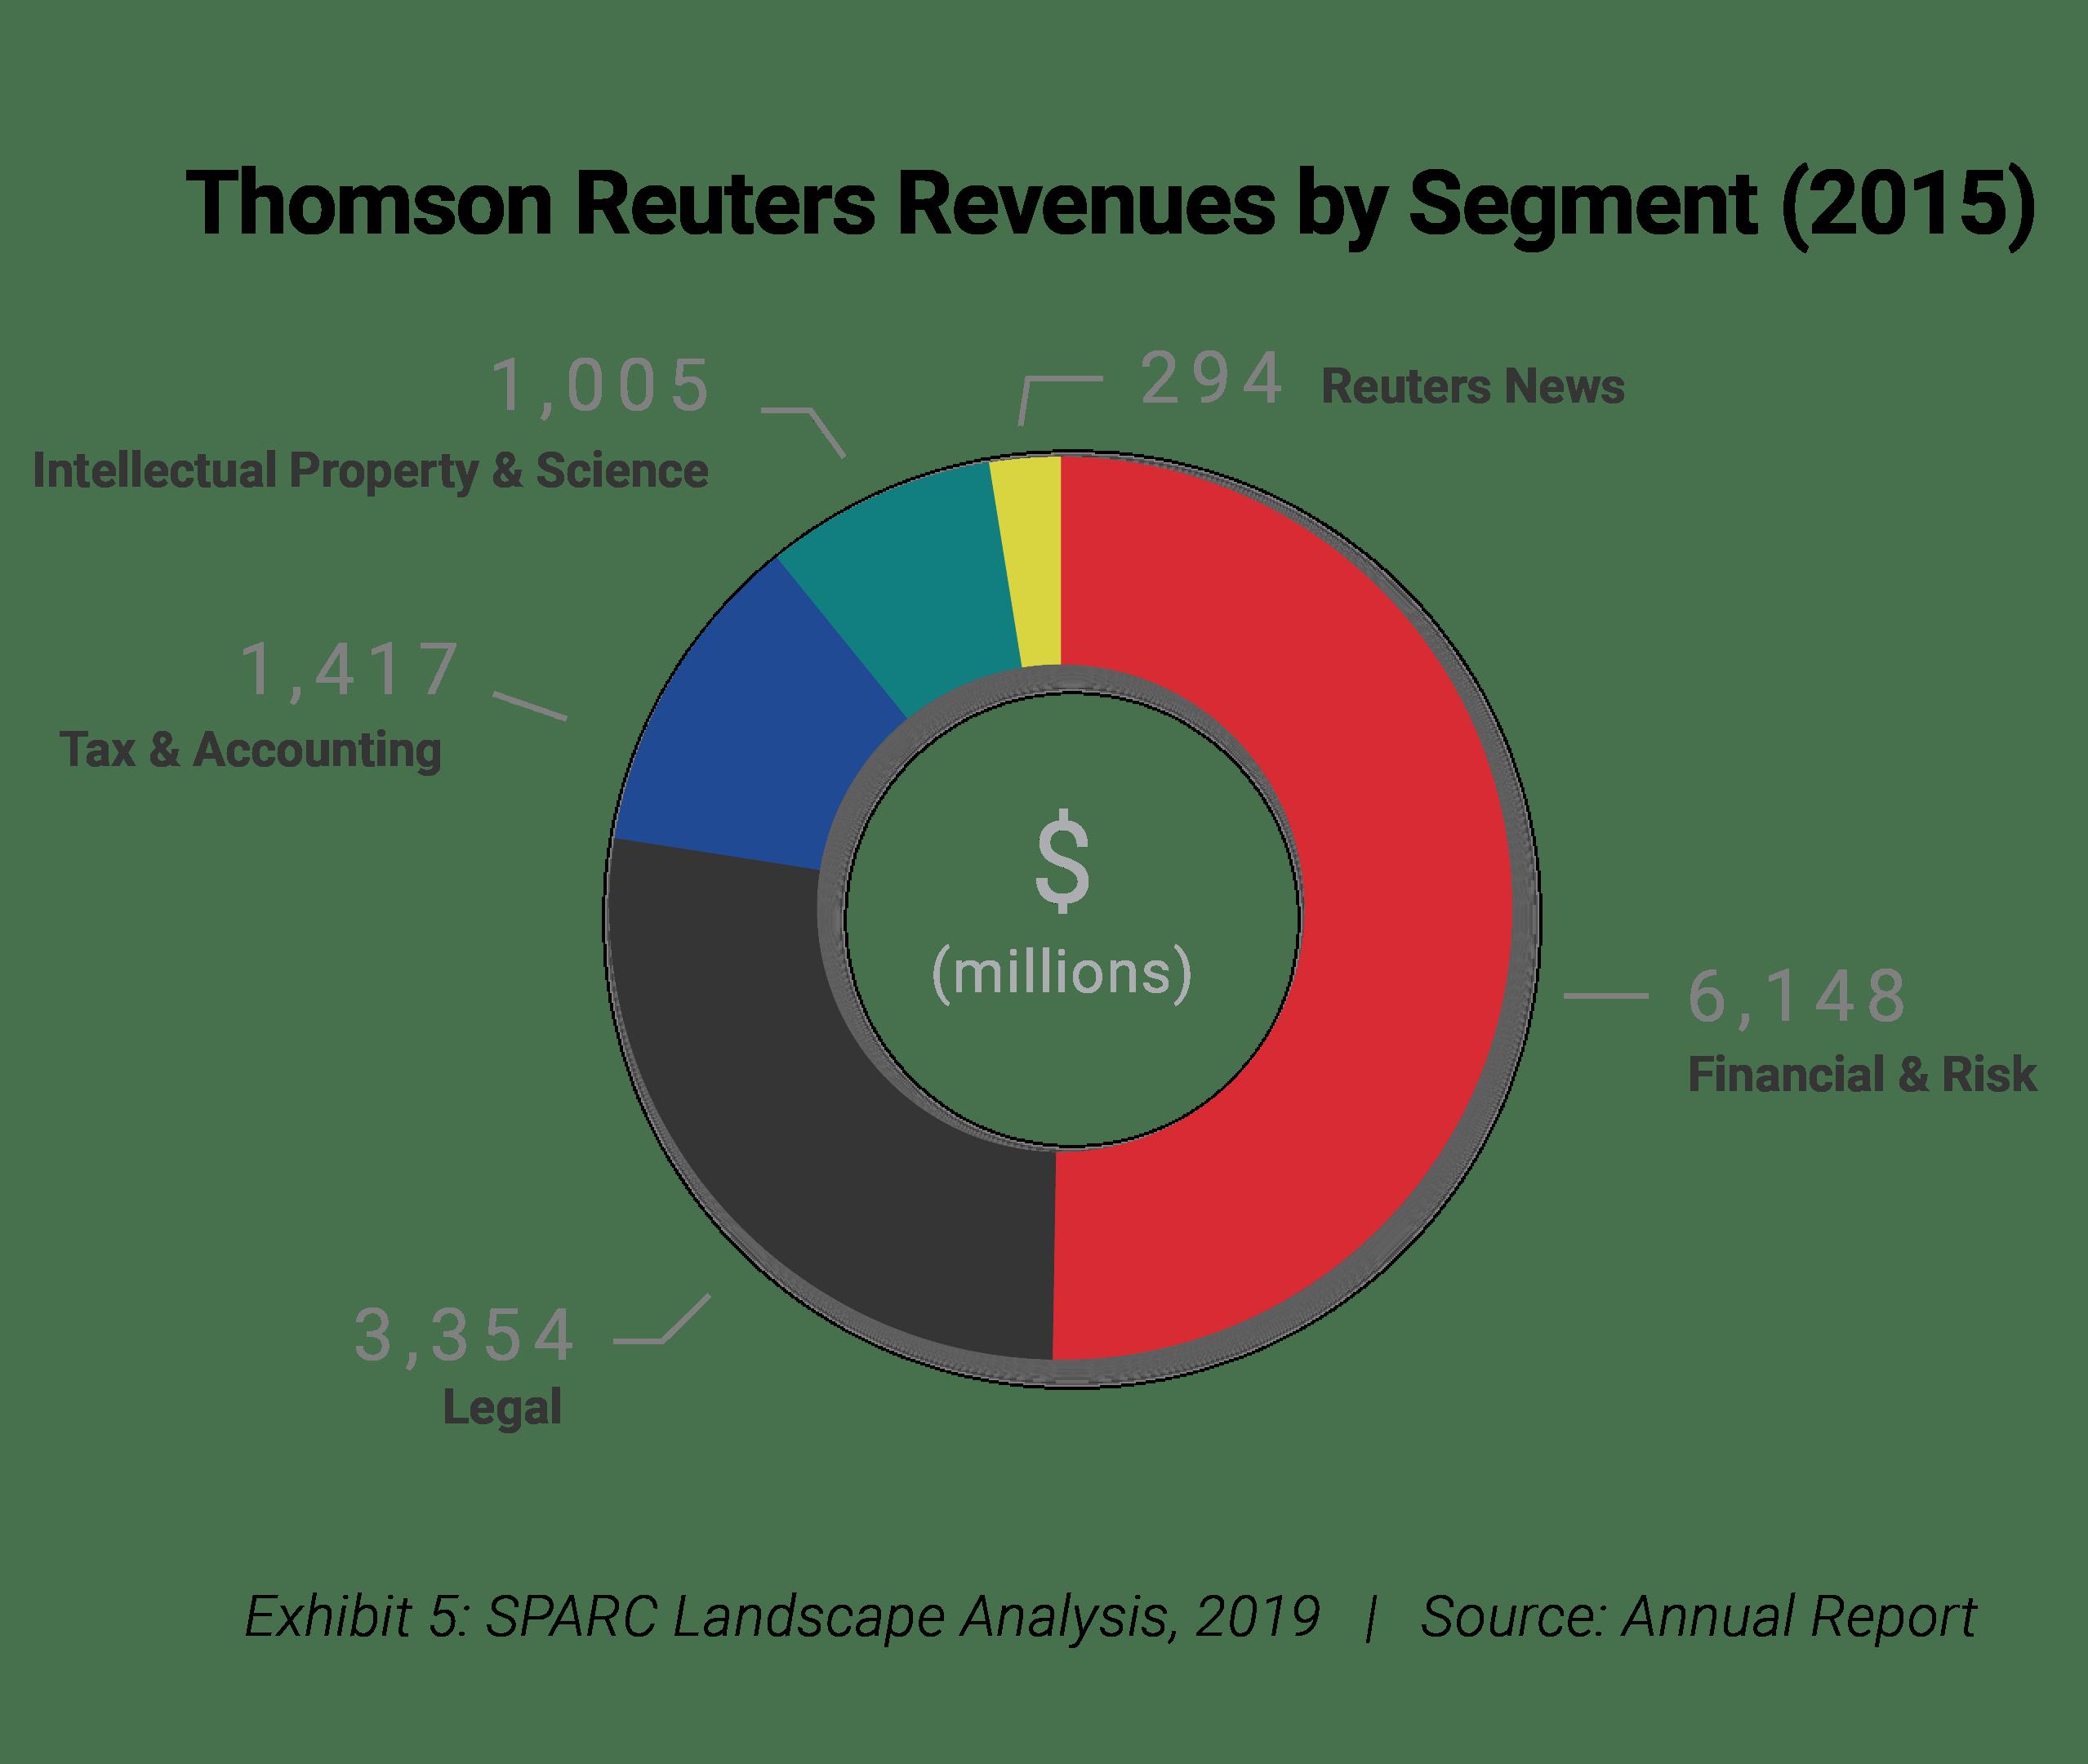 Thompson Reuters Revenue by Segment